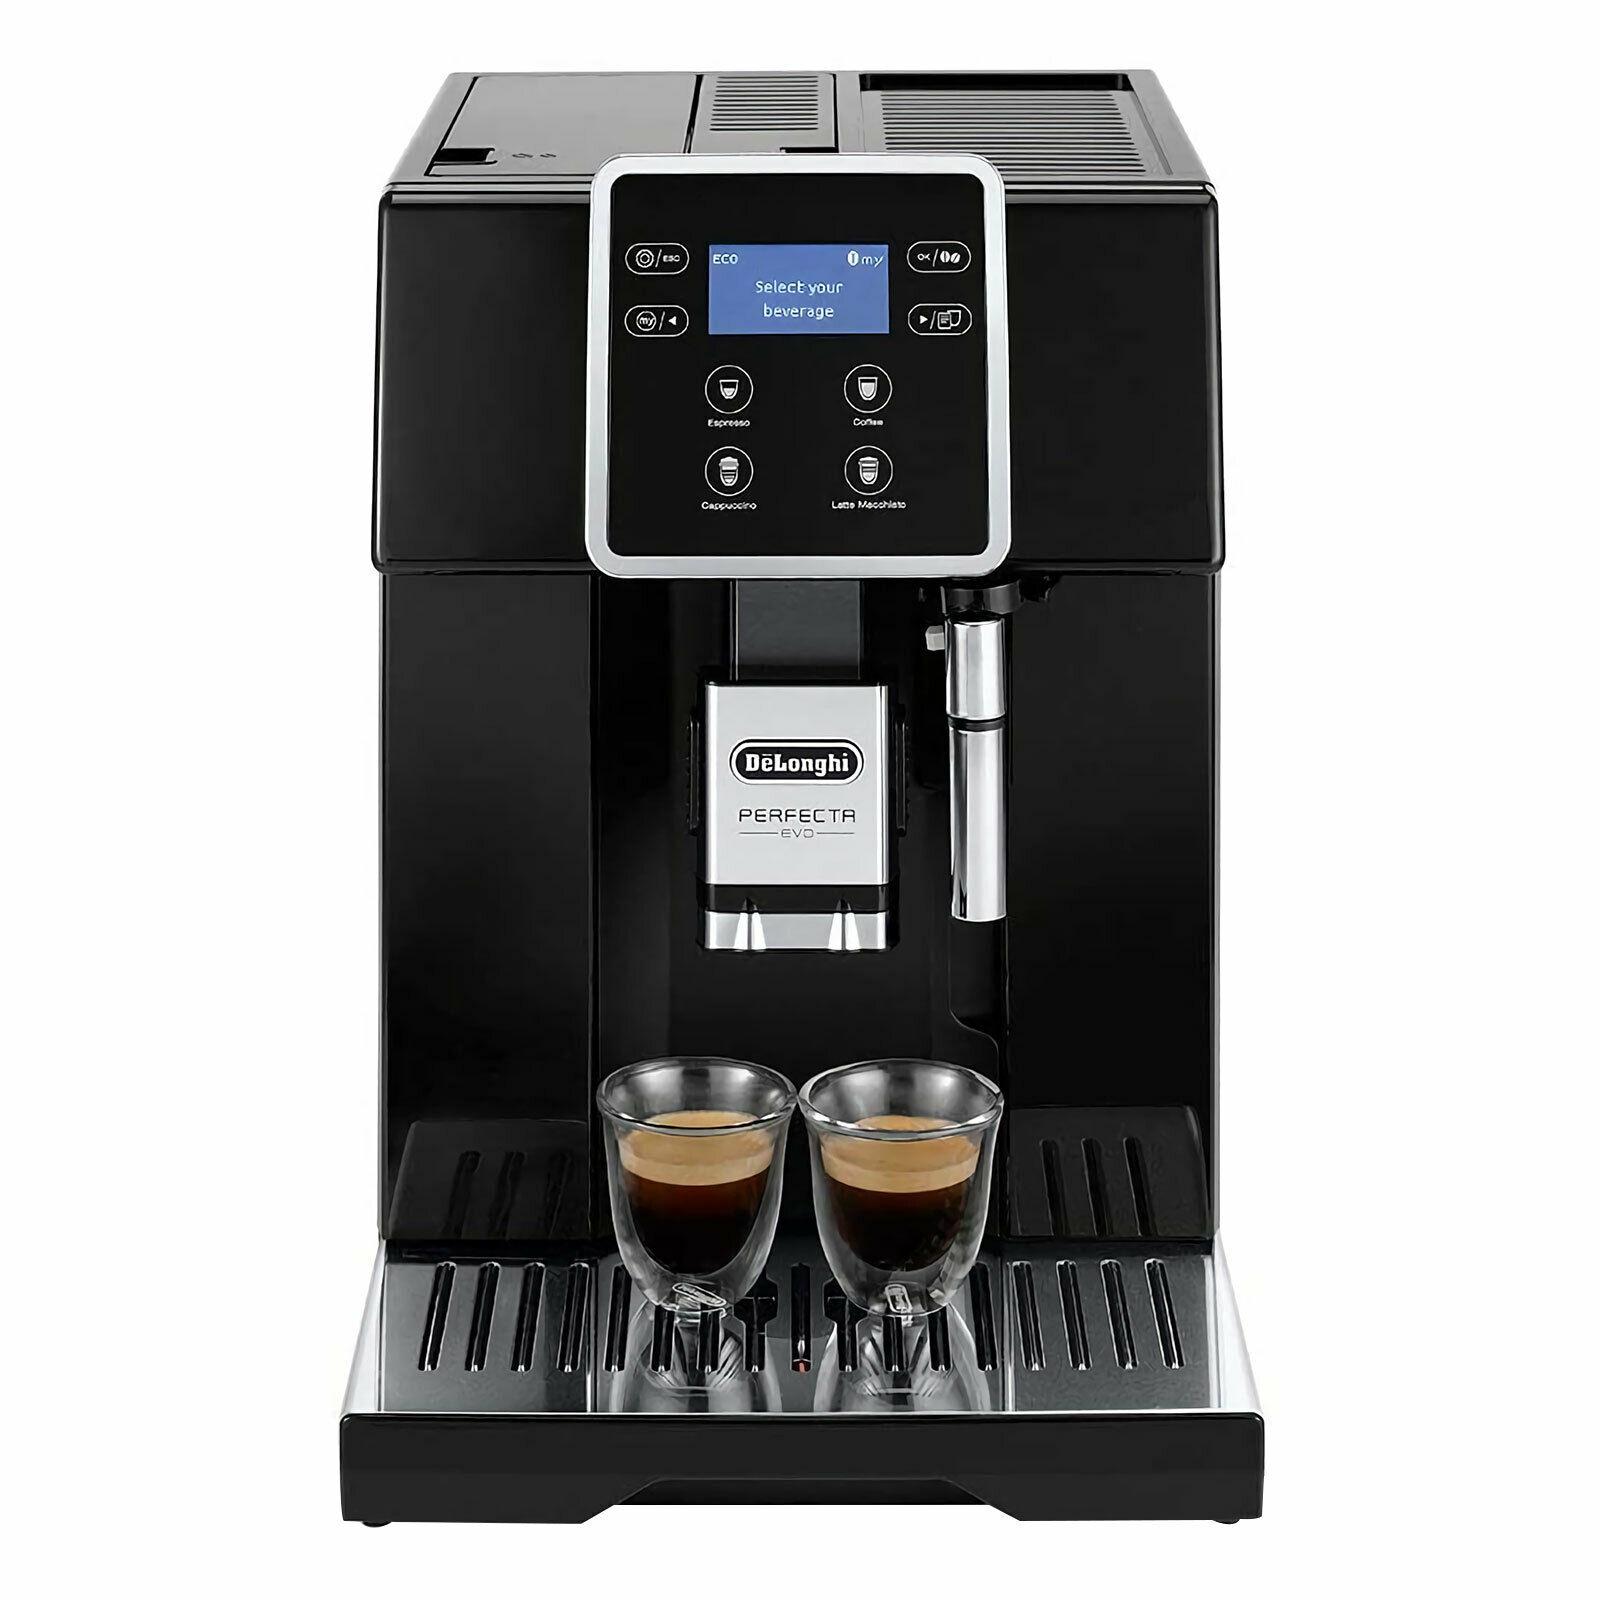 [ebay WOW] DeLonghi ESAM 420.40.B Perfecta EVO Kaffeevollautomat Kaffeemaschine zu 499,99€